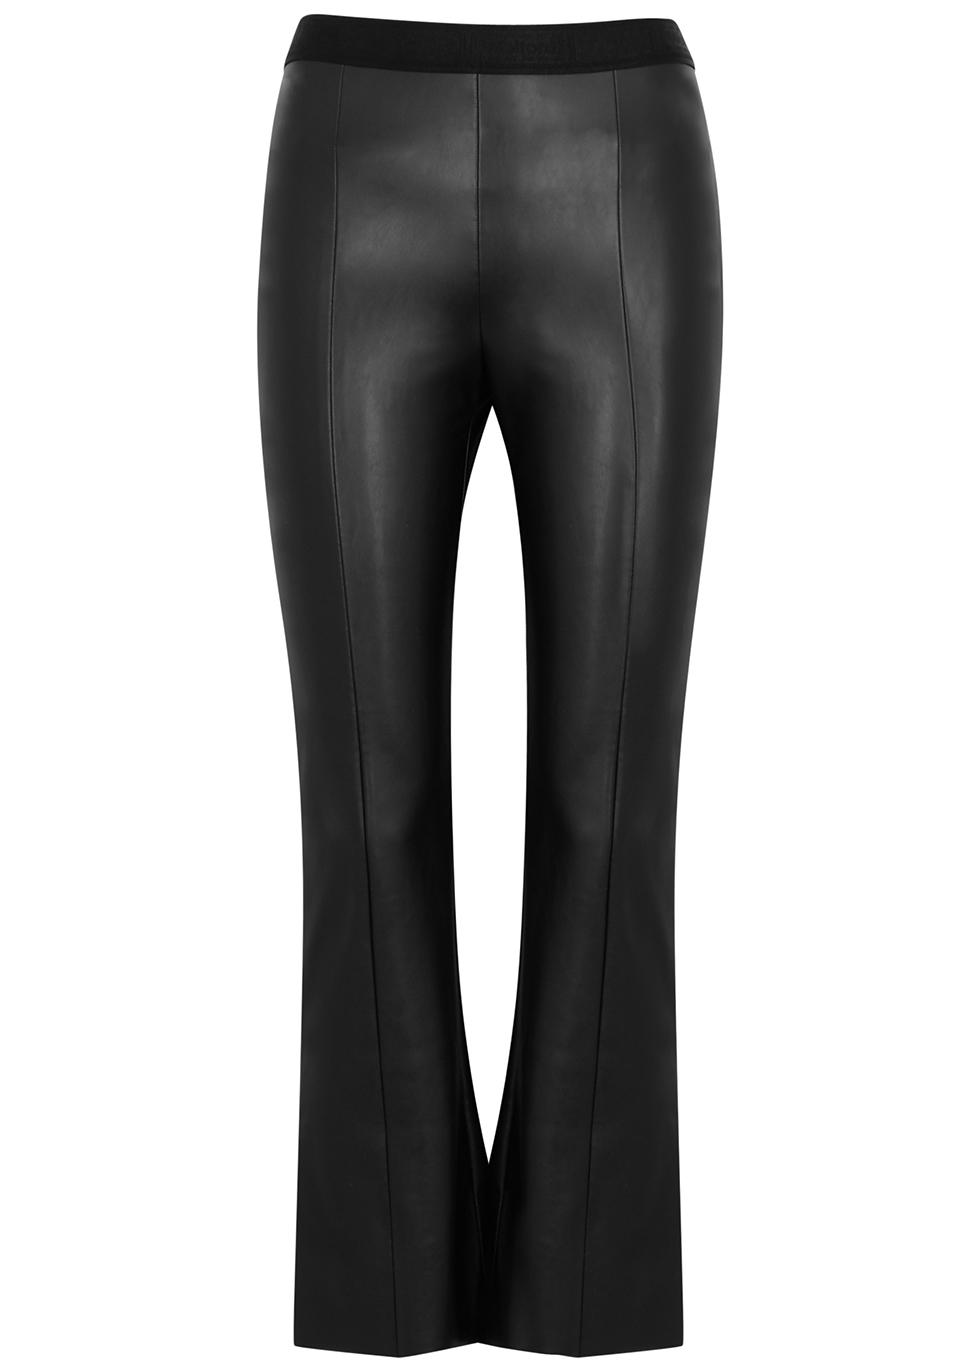 Jenna black faux leather kick-flare trousers